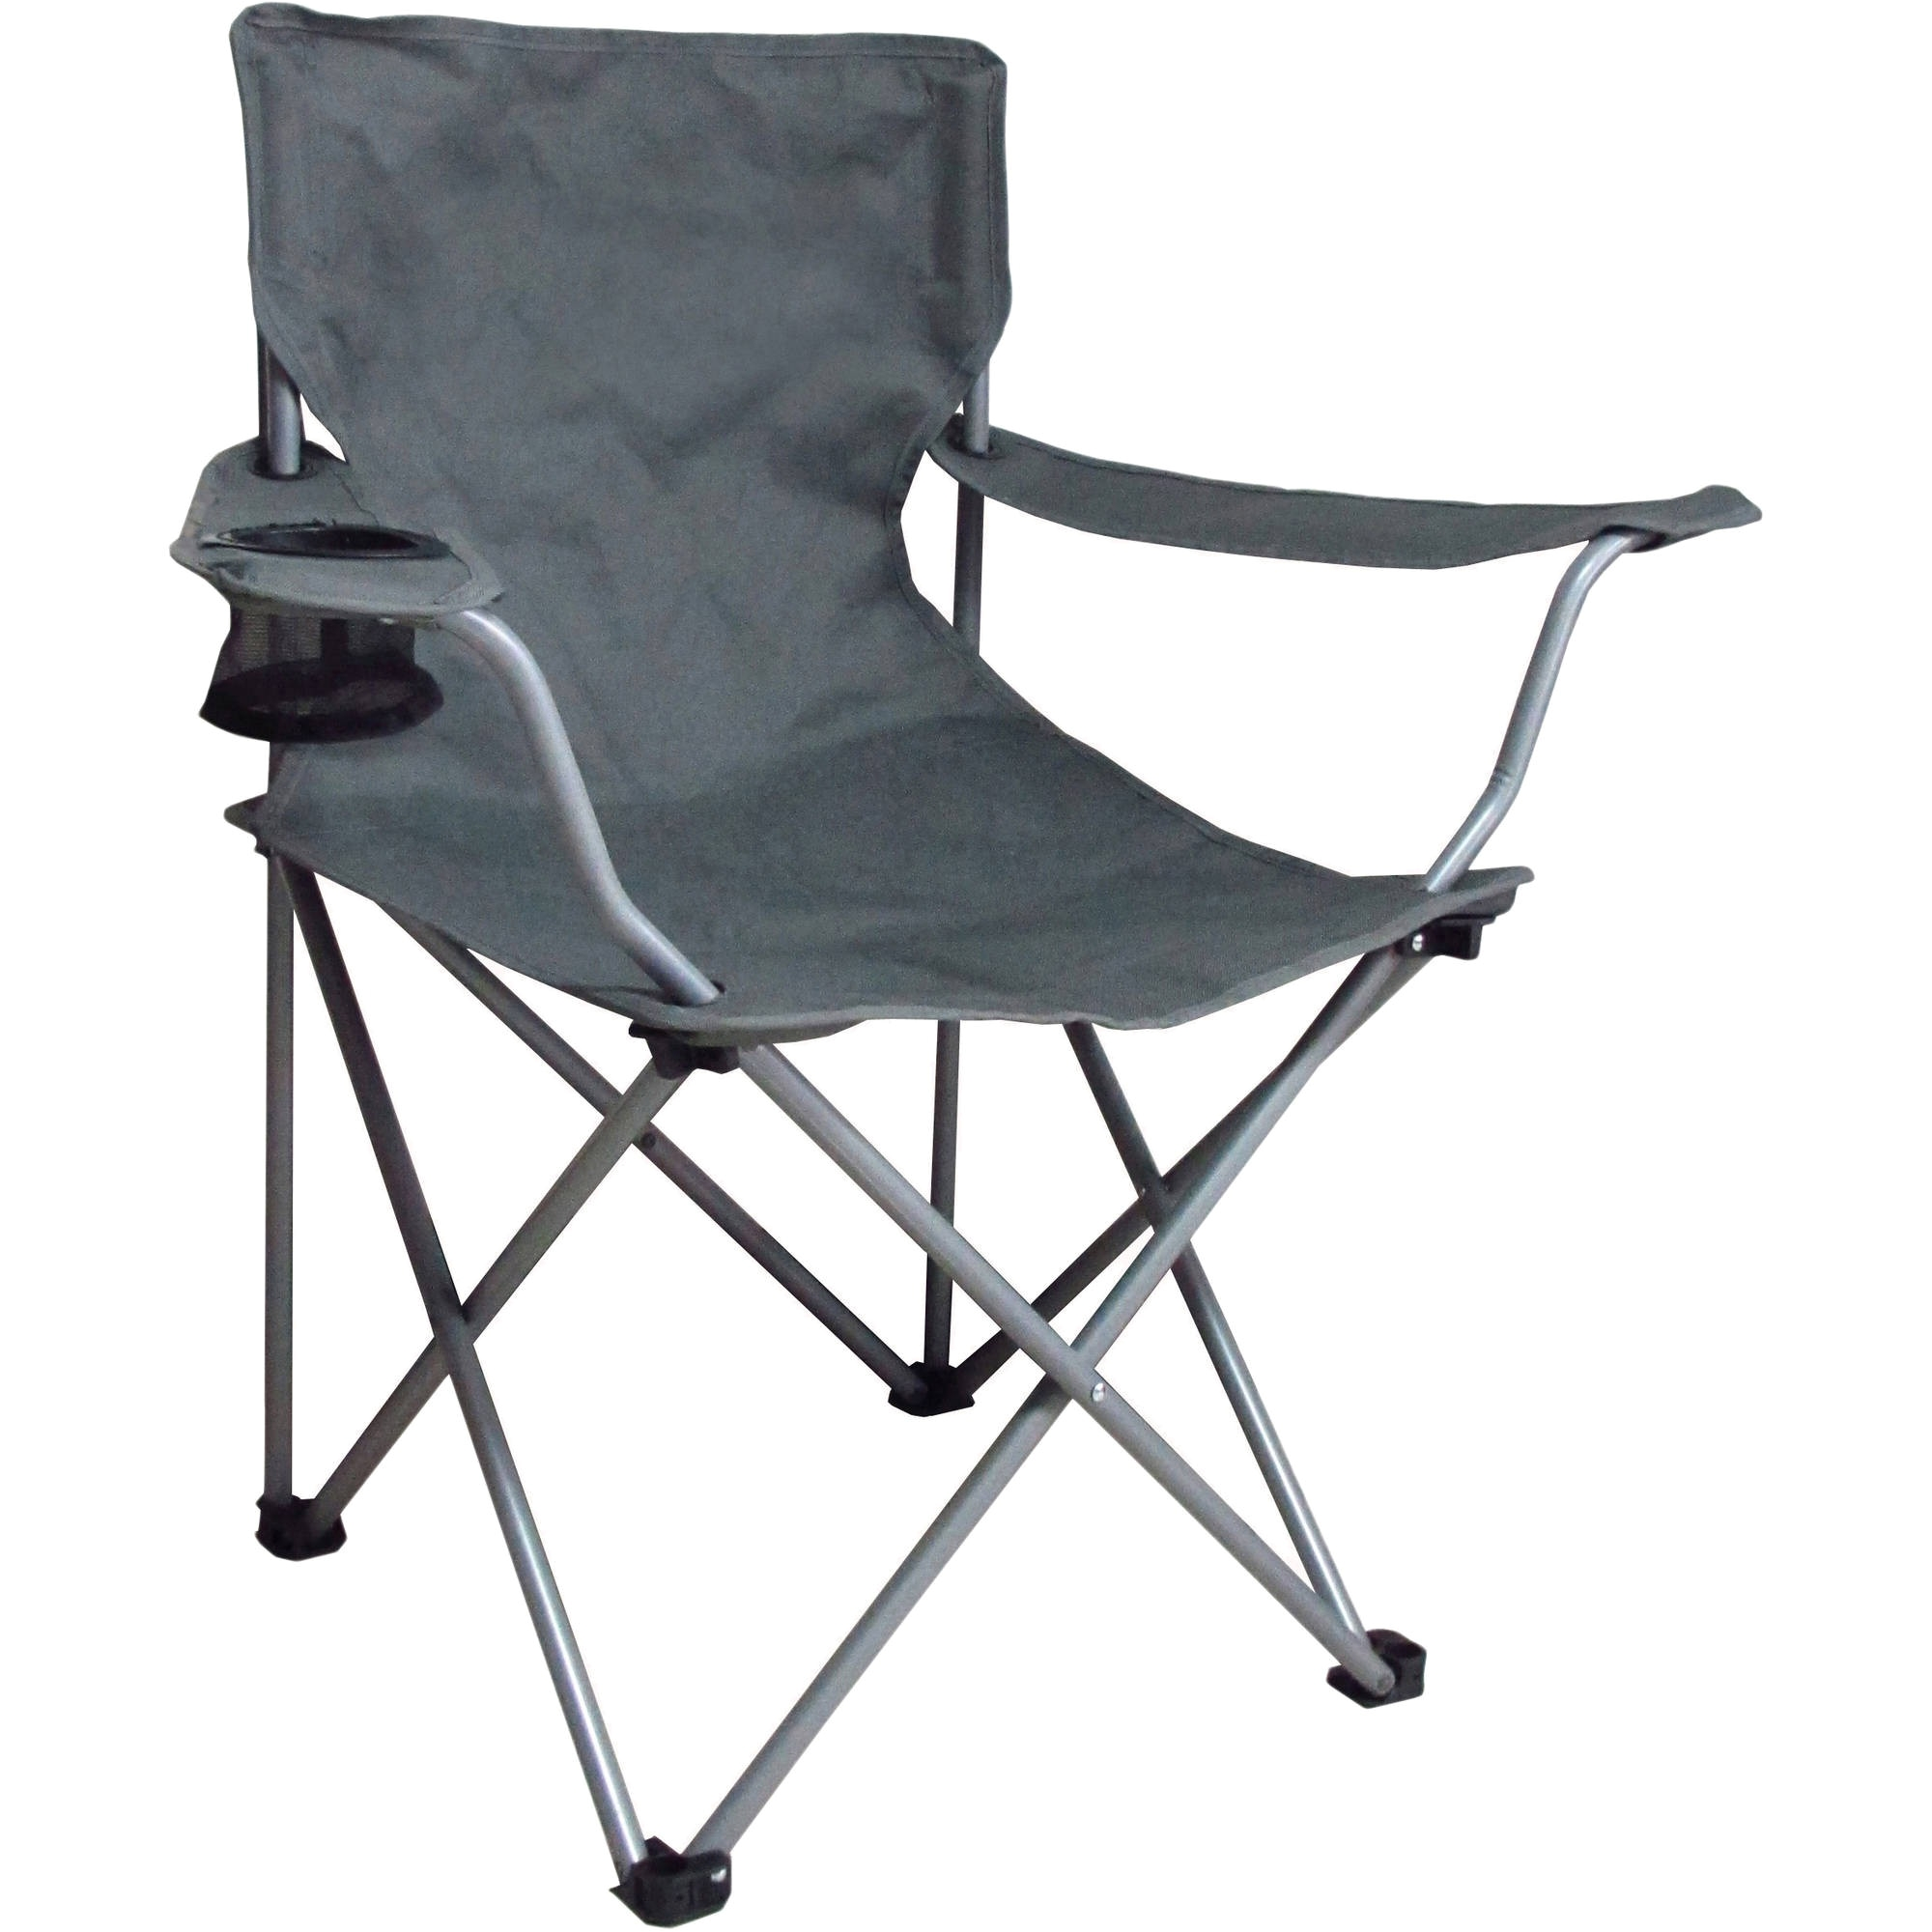 Cloth Folding Chairs Walmart Walmart Metal Chairs Best Of Nice Fabric Folding Chairs